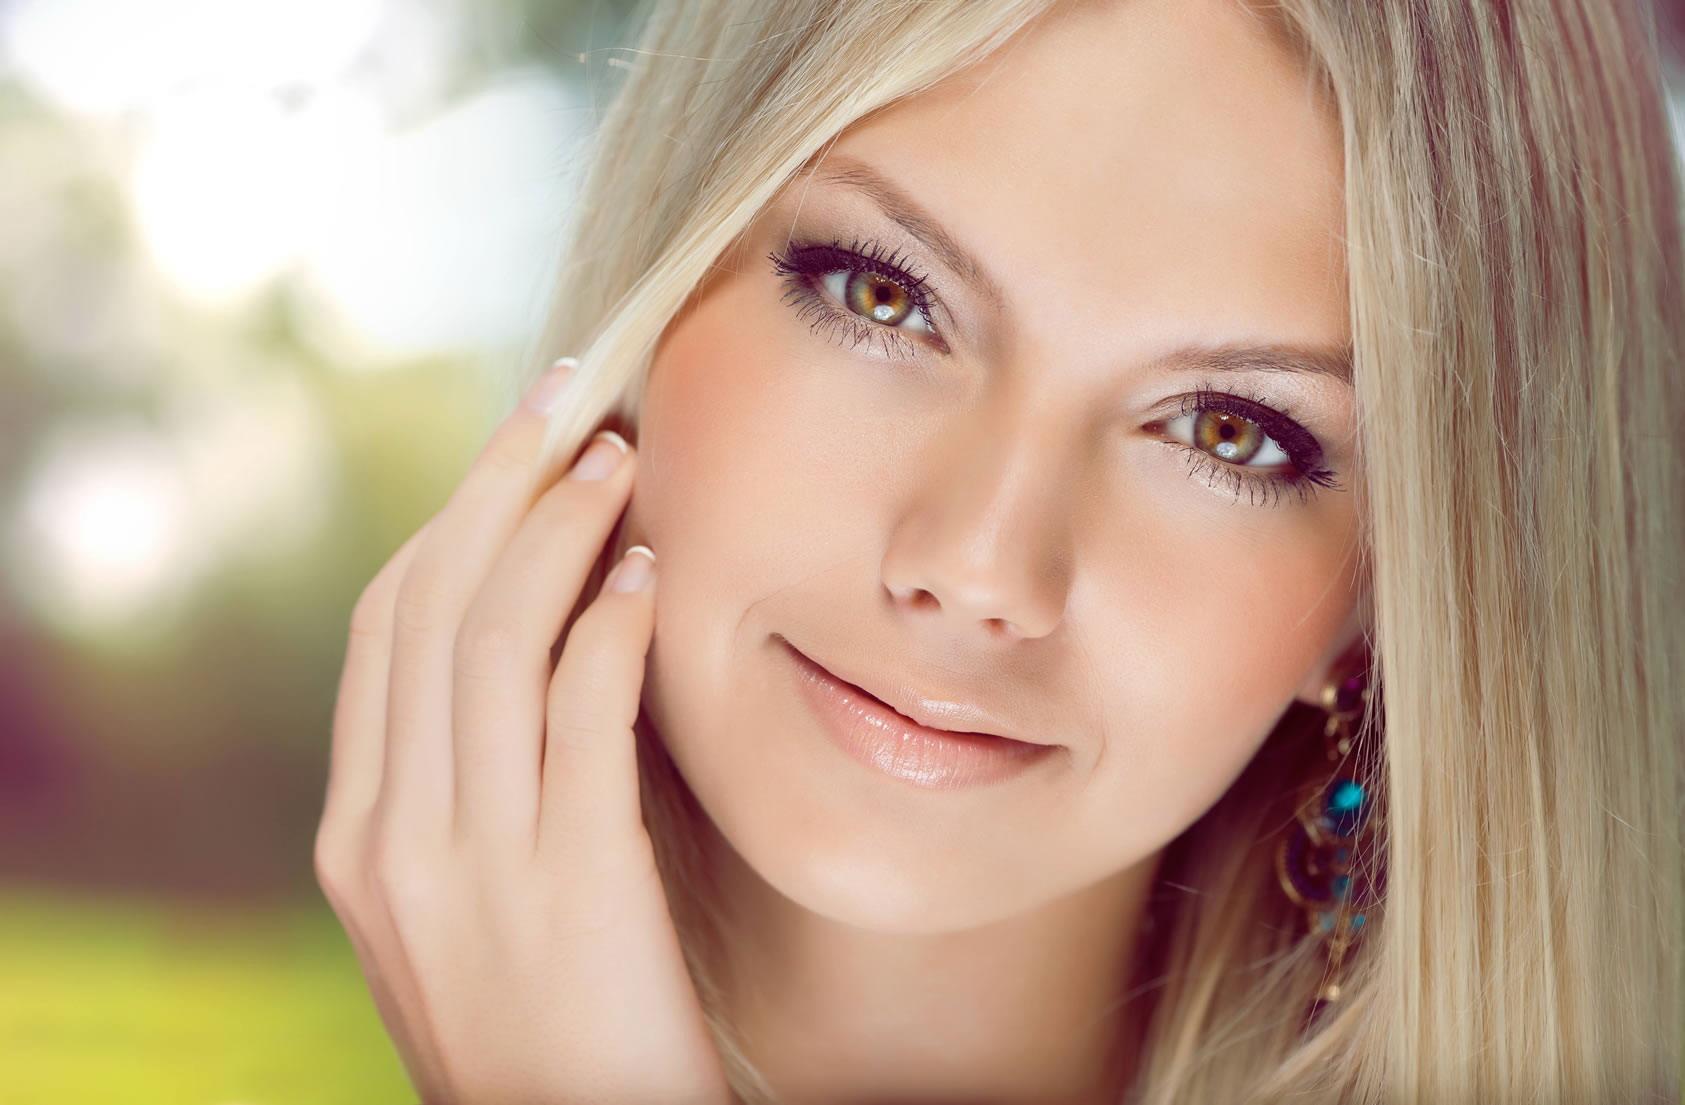 Фото молодой девушки лицо